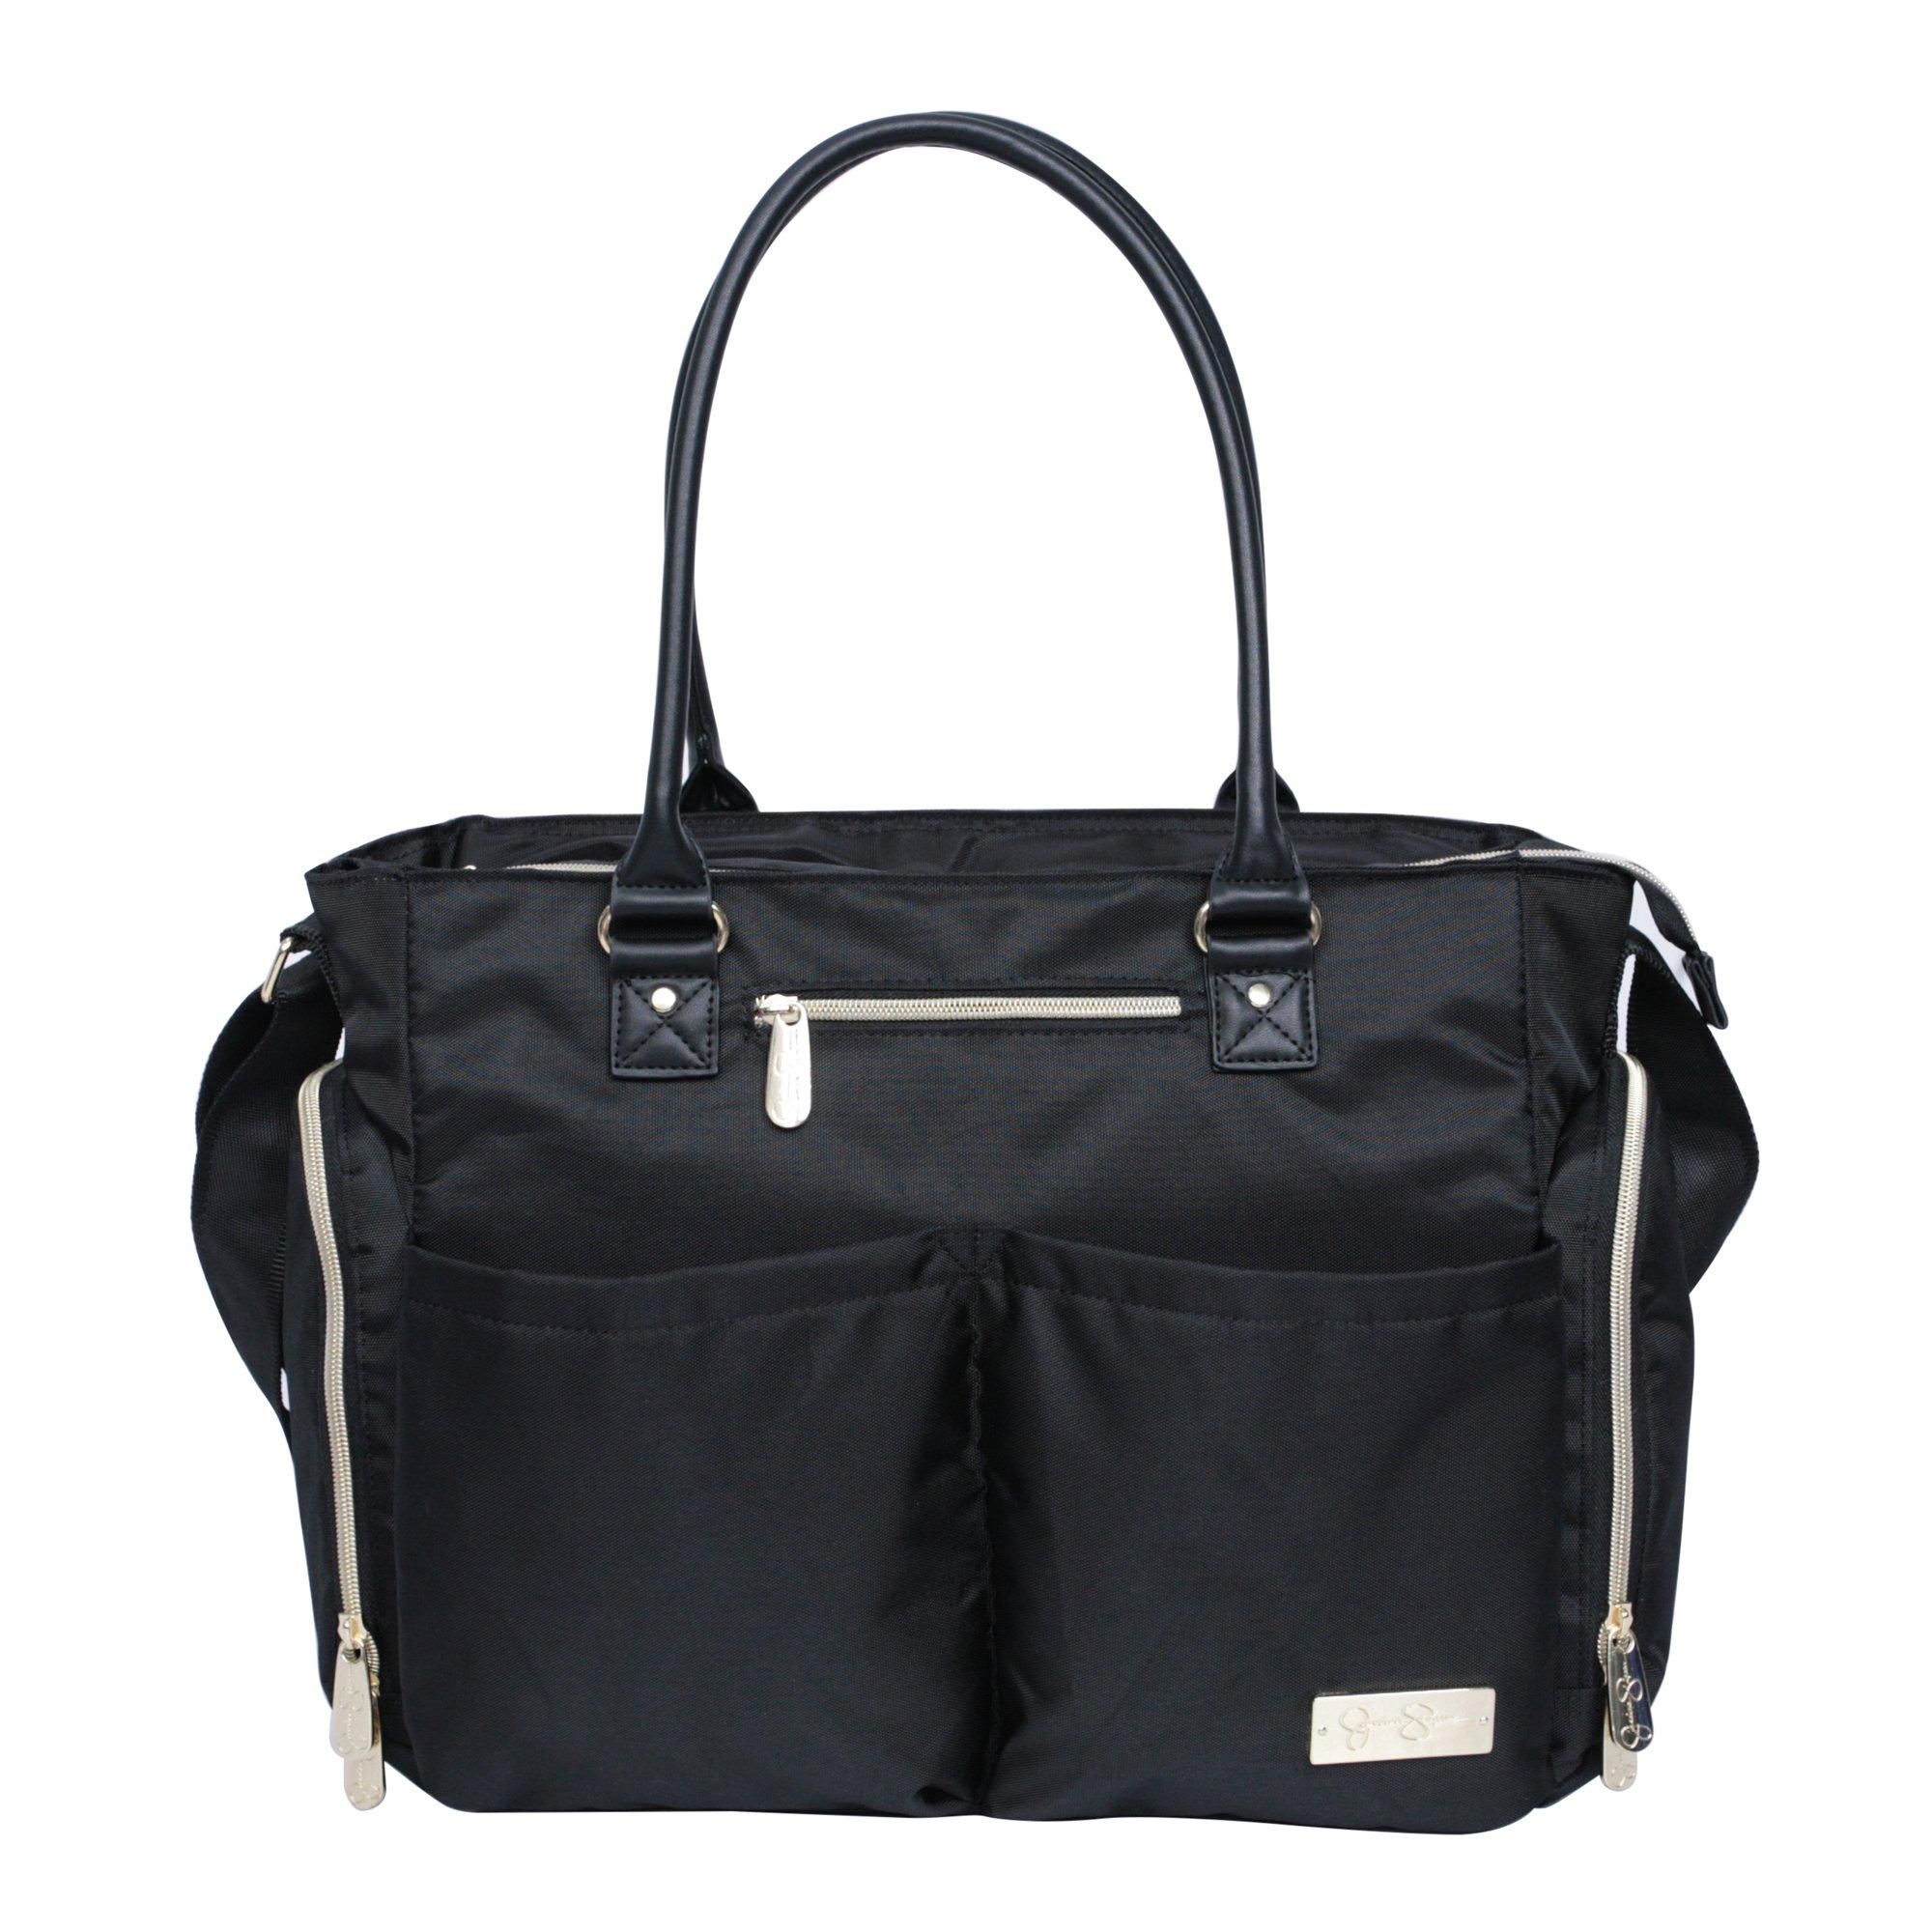 Jessica Simpson 3Pc City Tote Diaper Bag Baby Shoulder Handbag Purse, Black